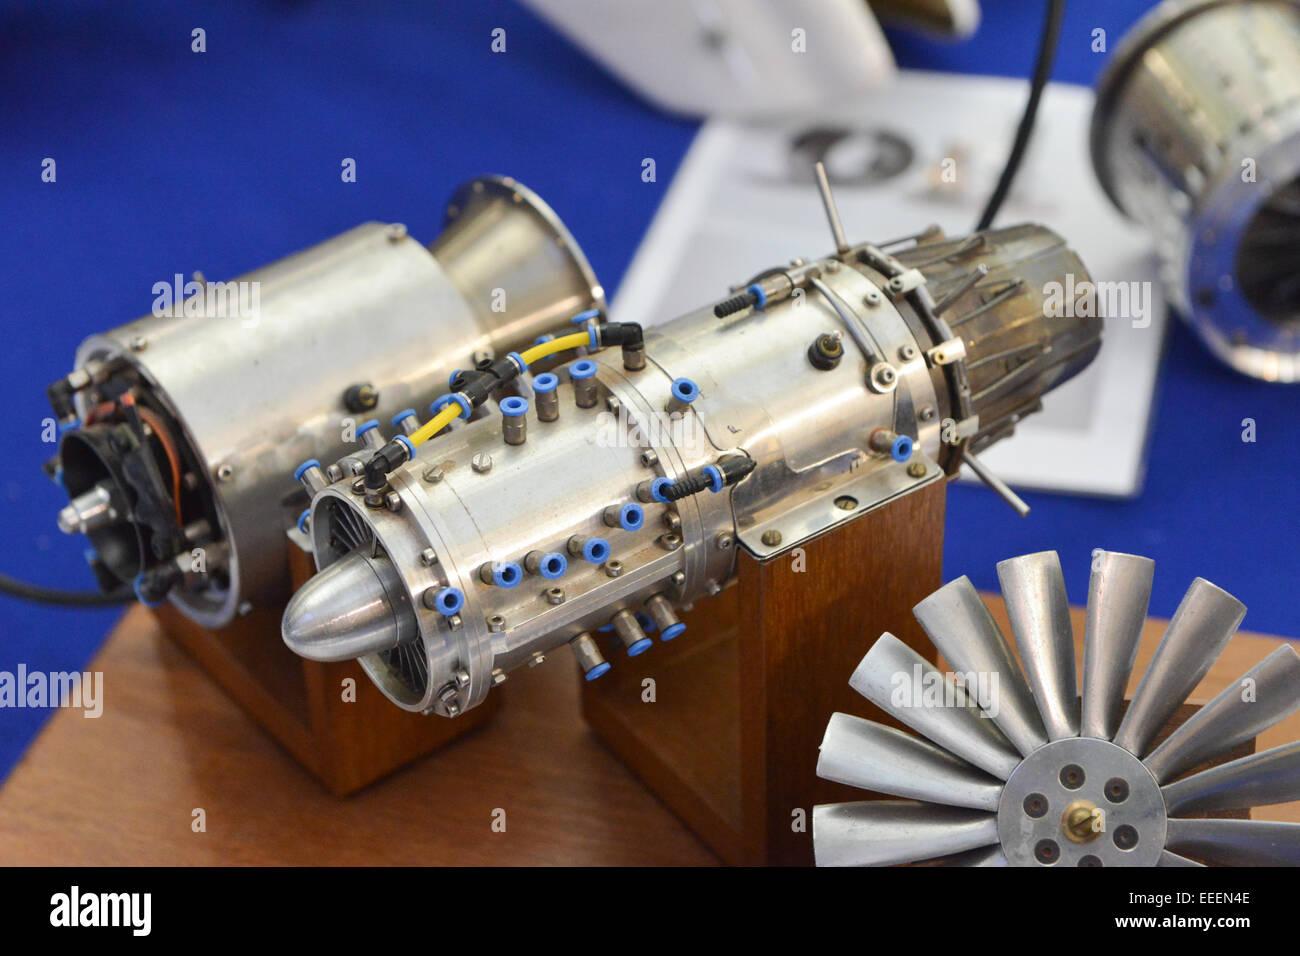 Alexandra Palace, London, UK  16th January 2015  Jet engines